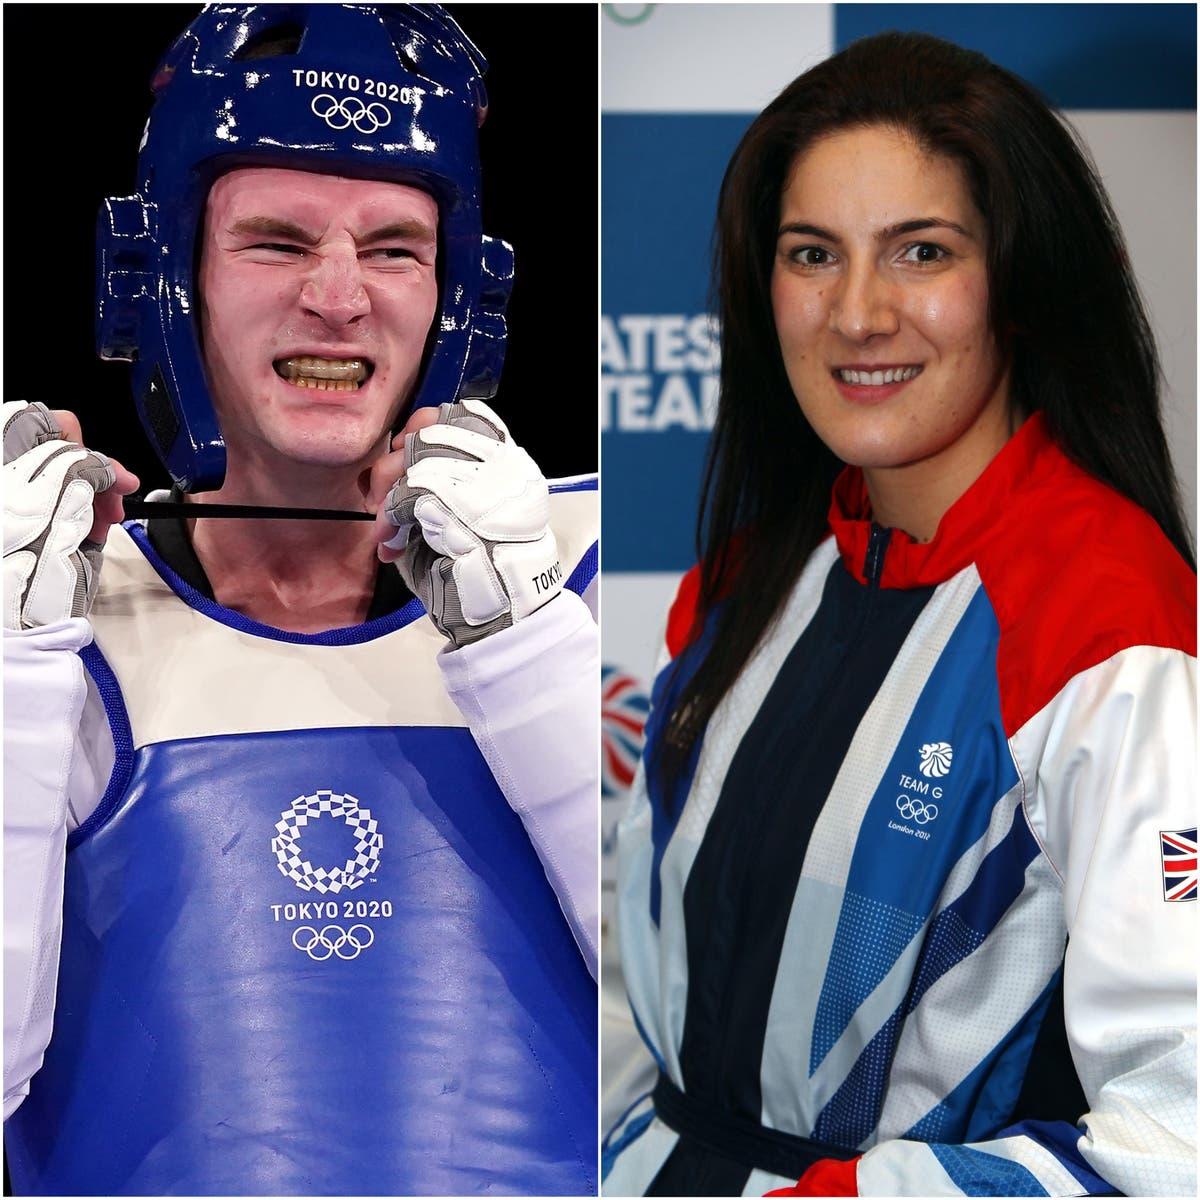 Bradly Sinden continues Team GB taekwondo success started by Sarah Stevenson